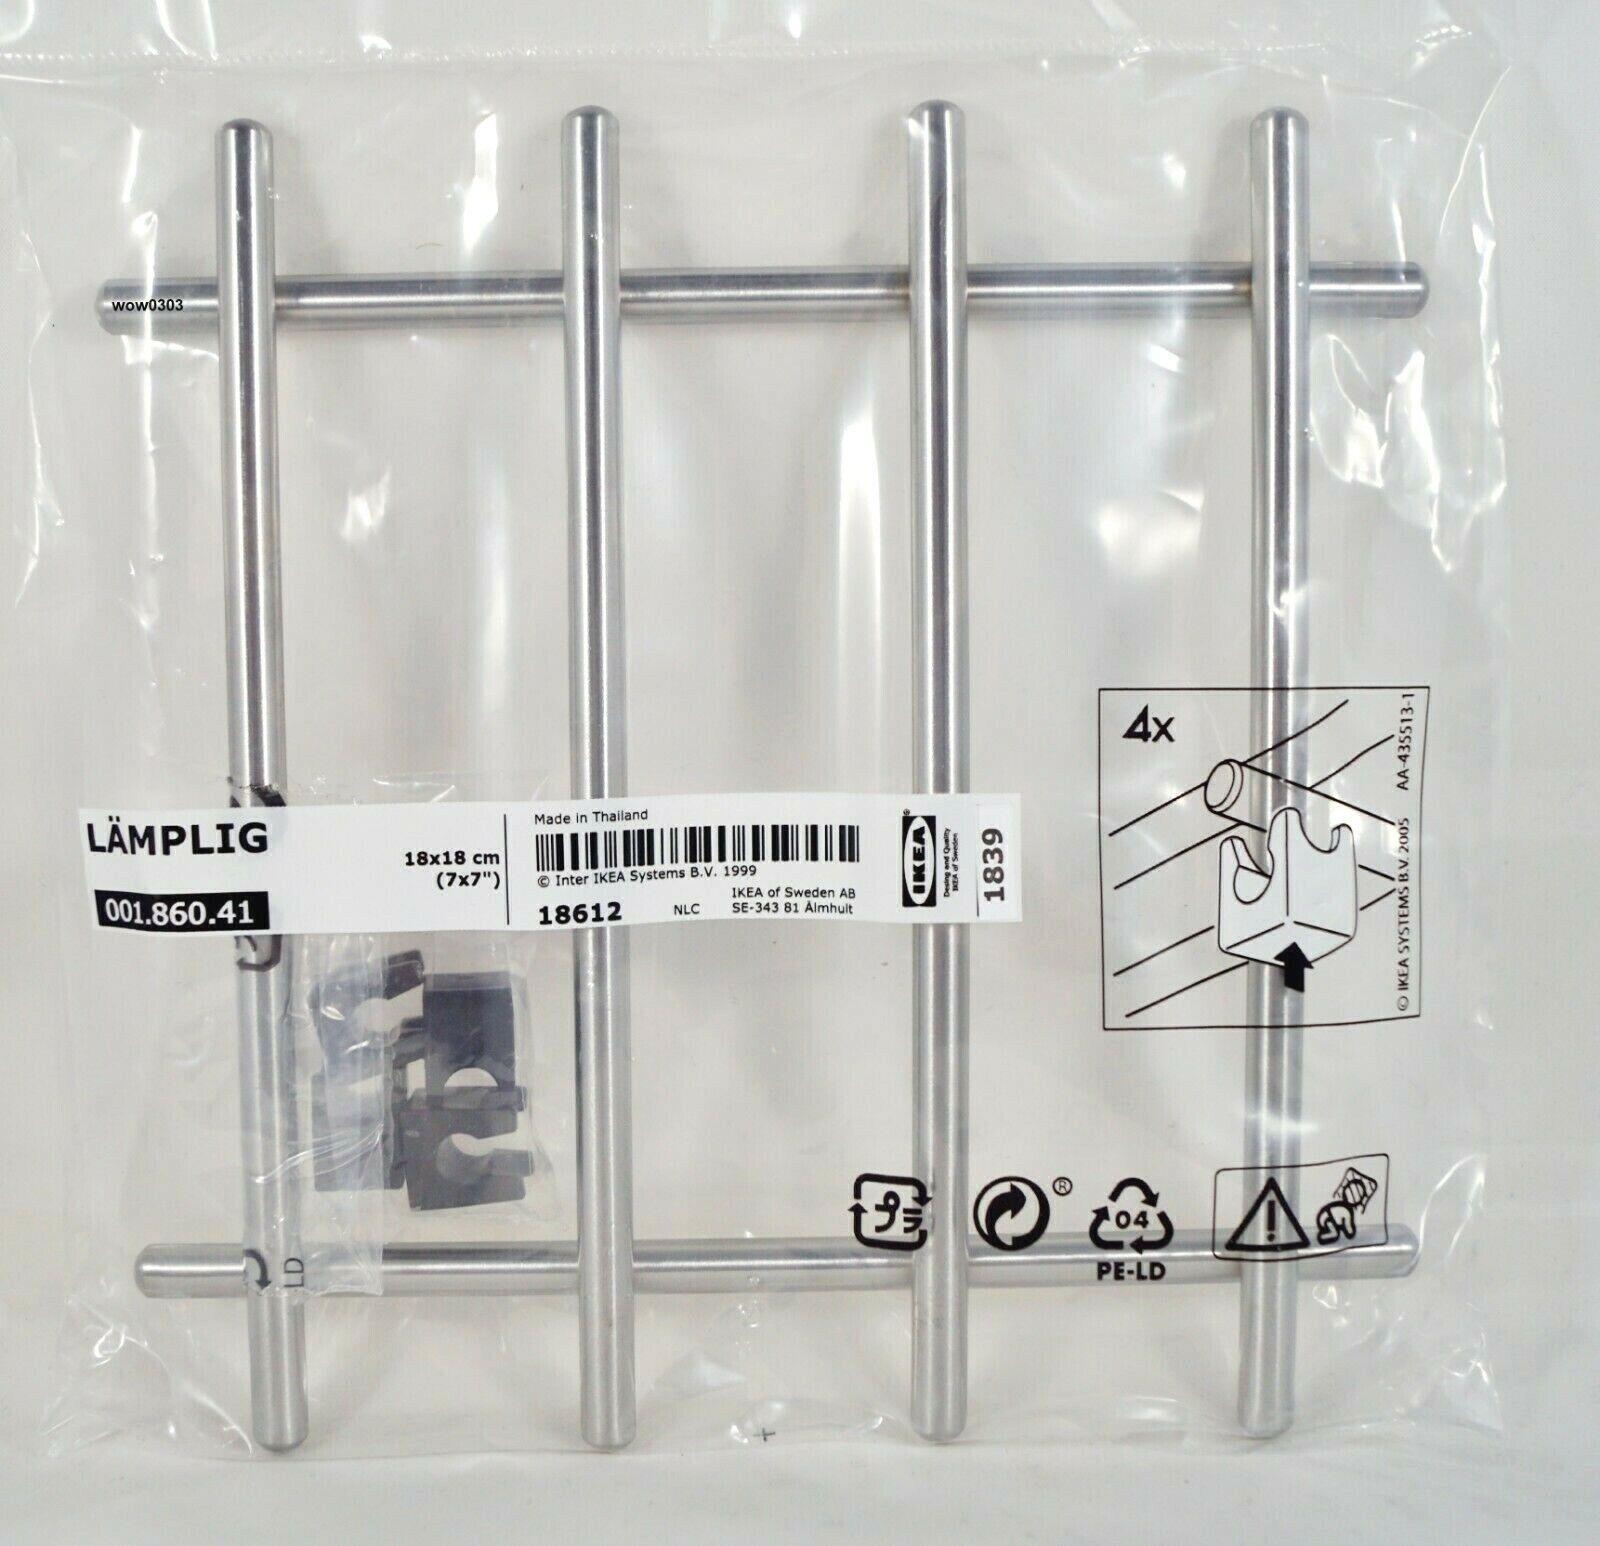 Ikea Coupon Lieferkosten - Test 4